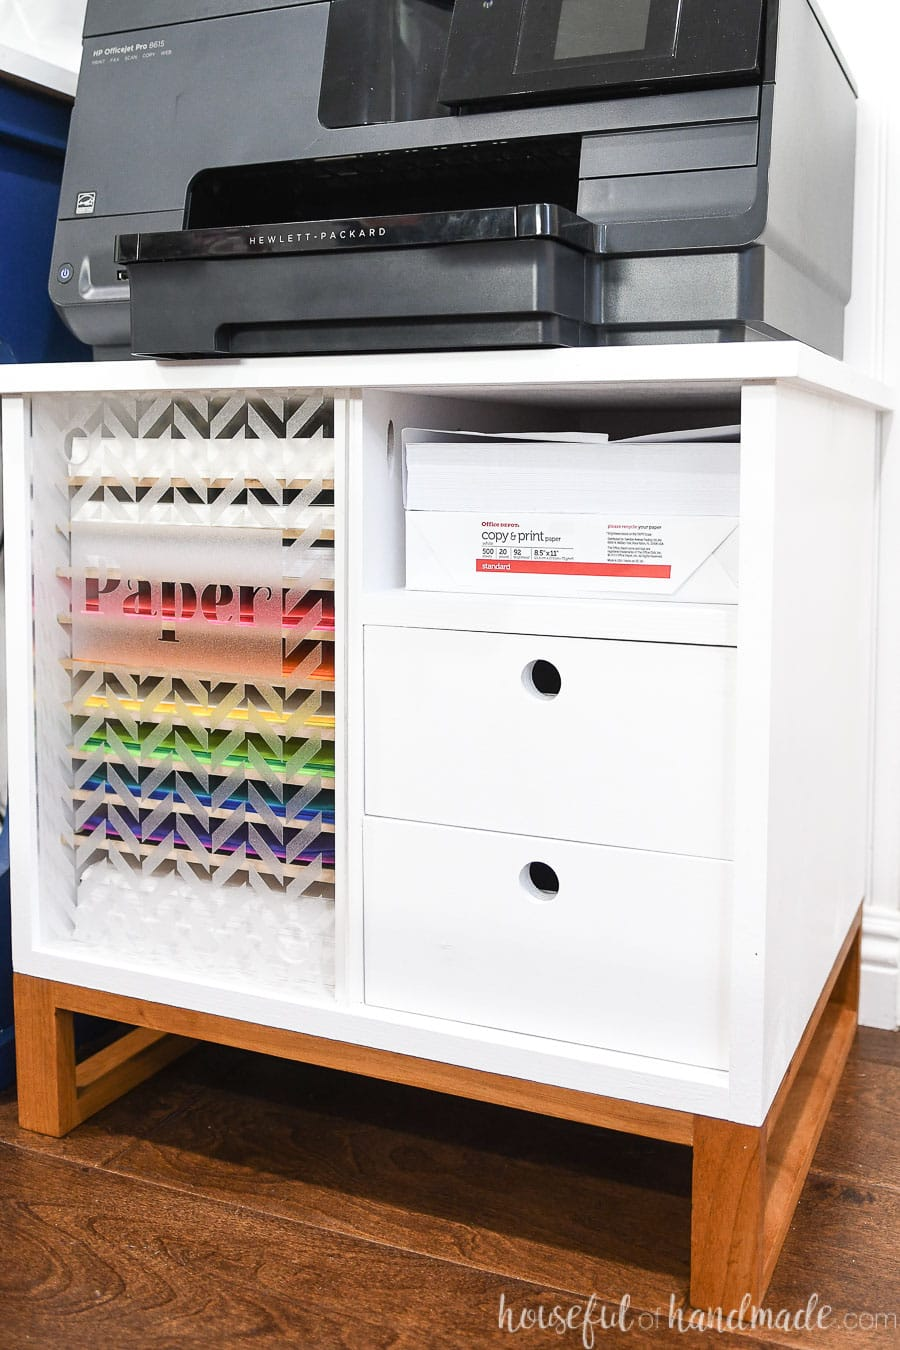 White printer table with printer on top.